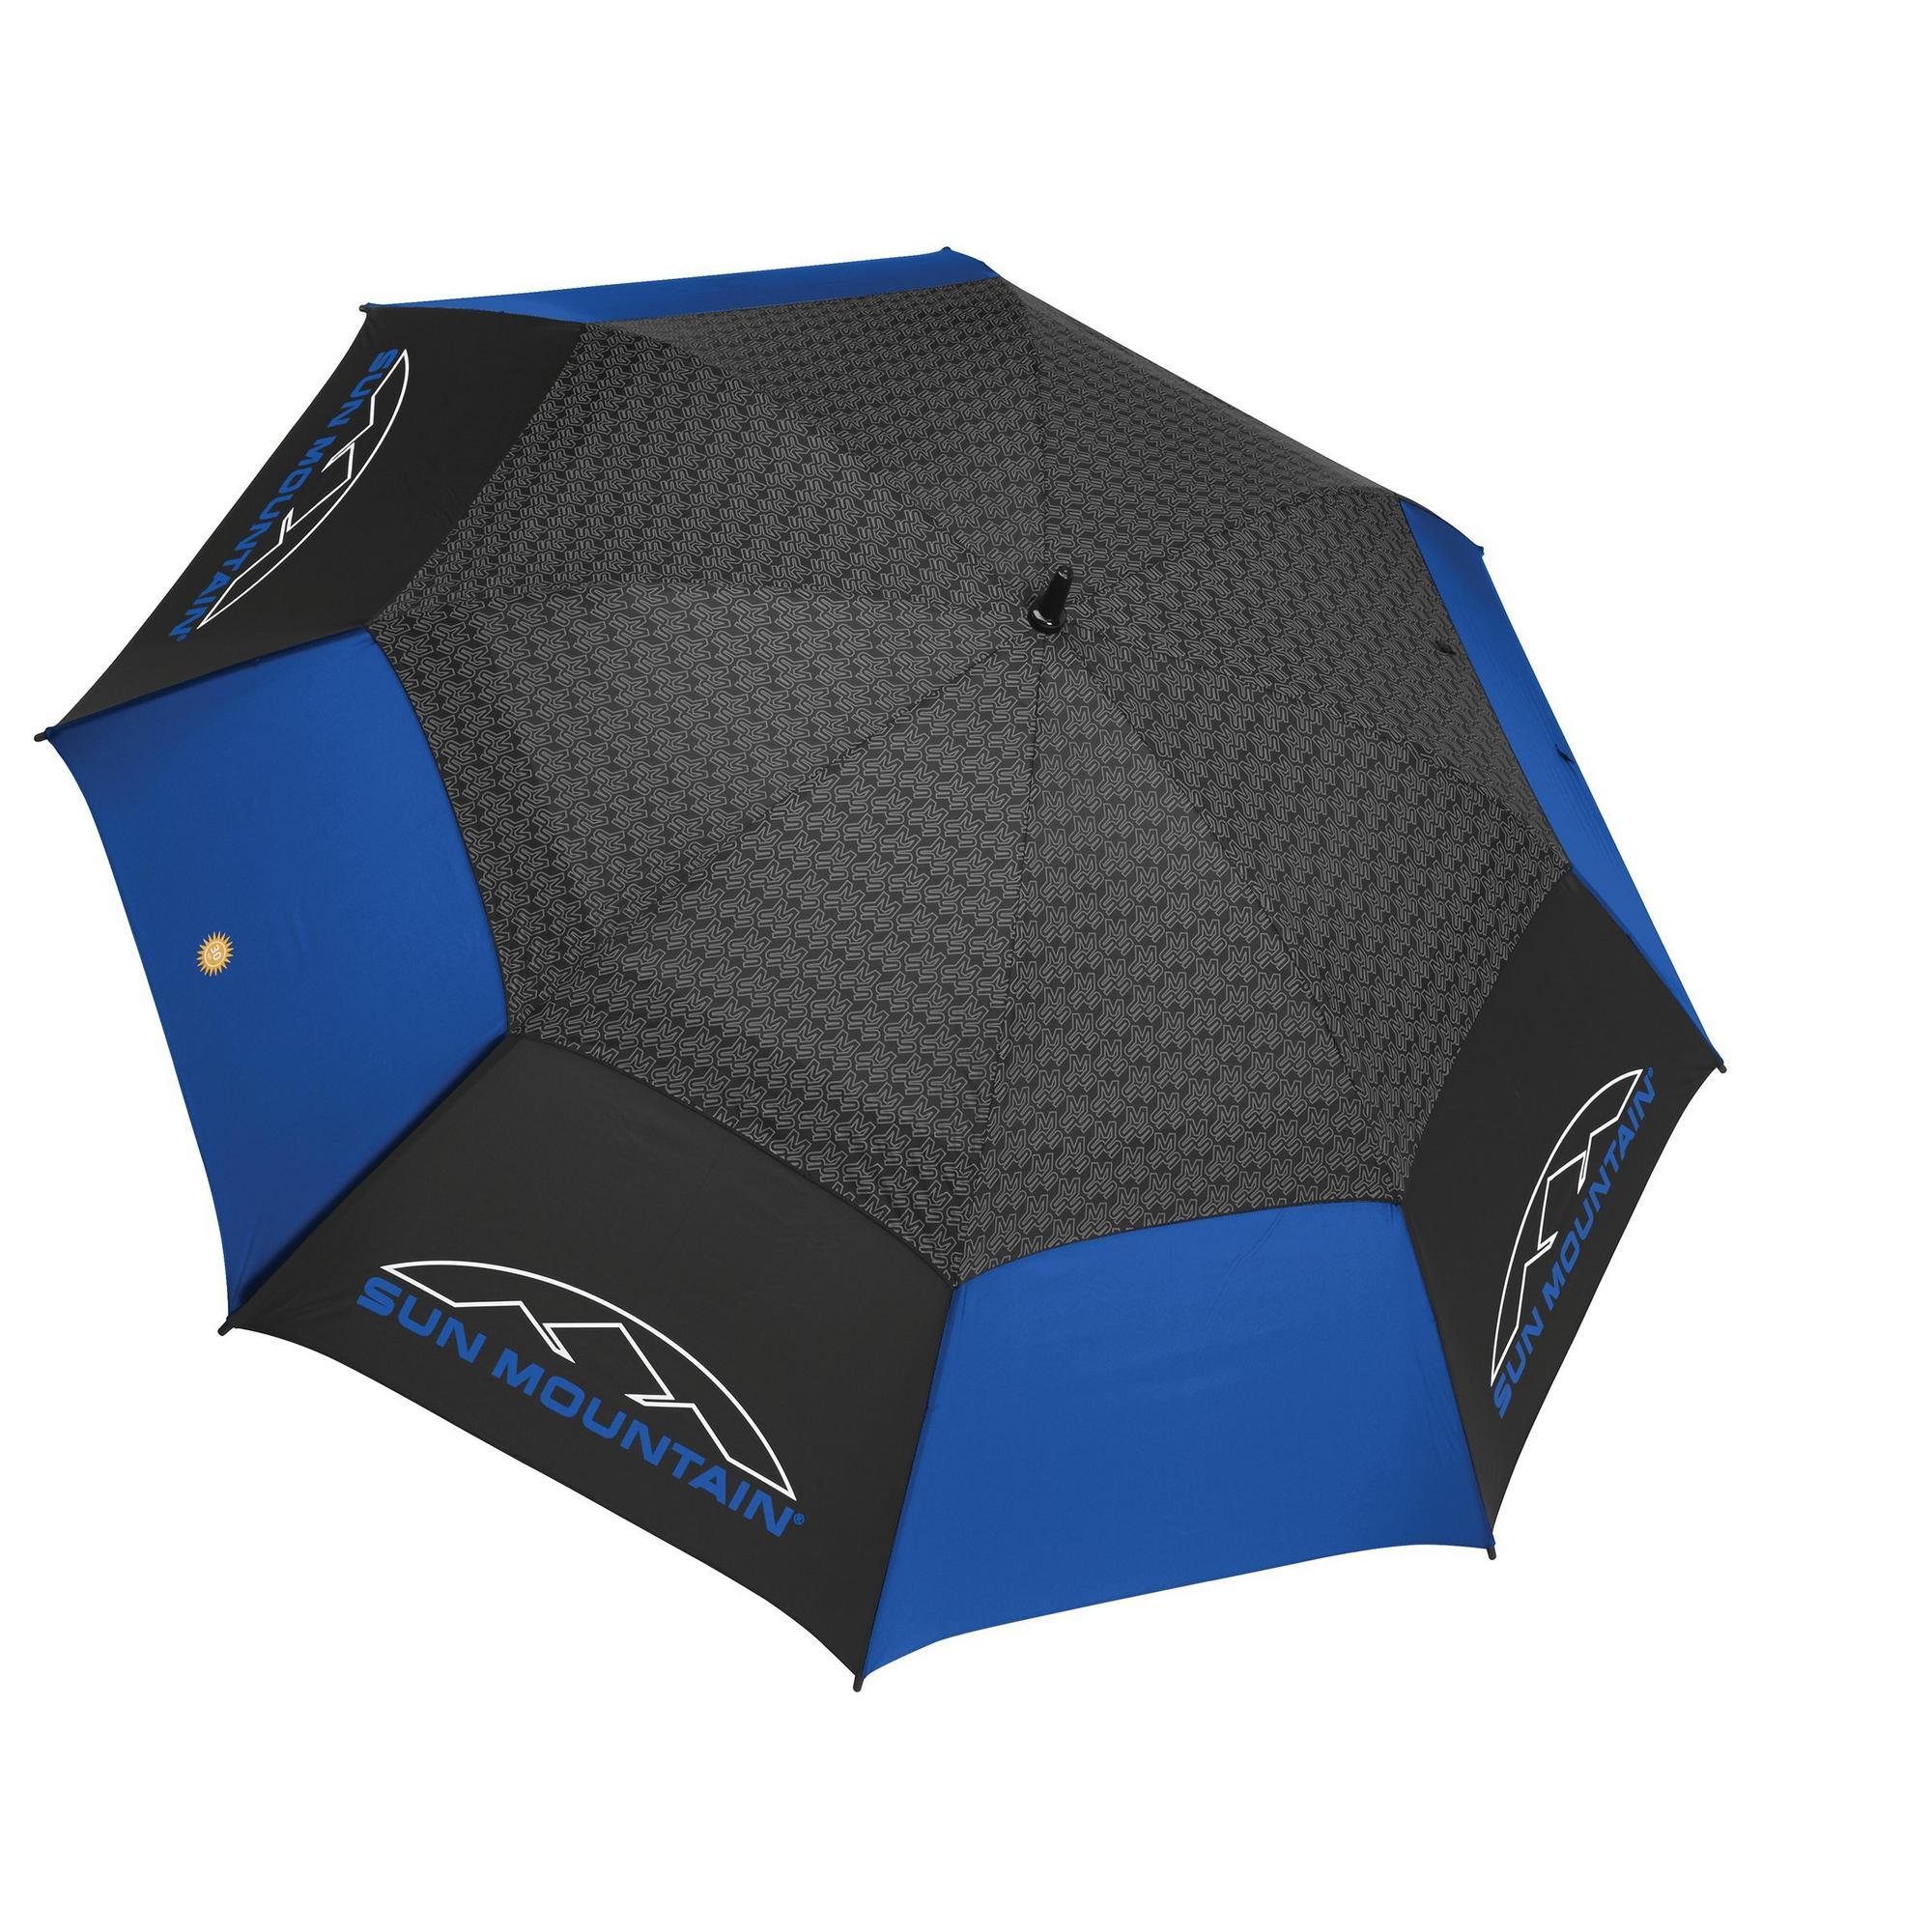 Double-Canopy Manual Umbrella